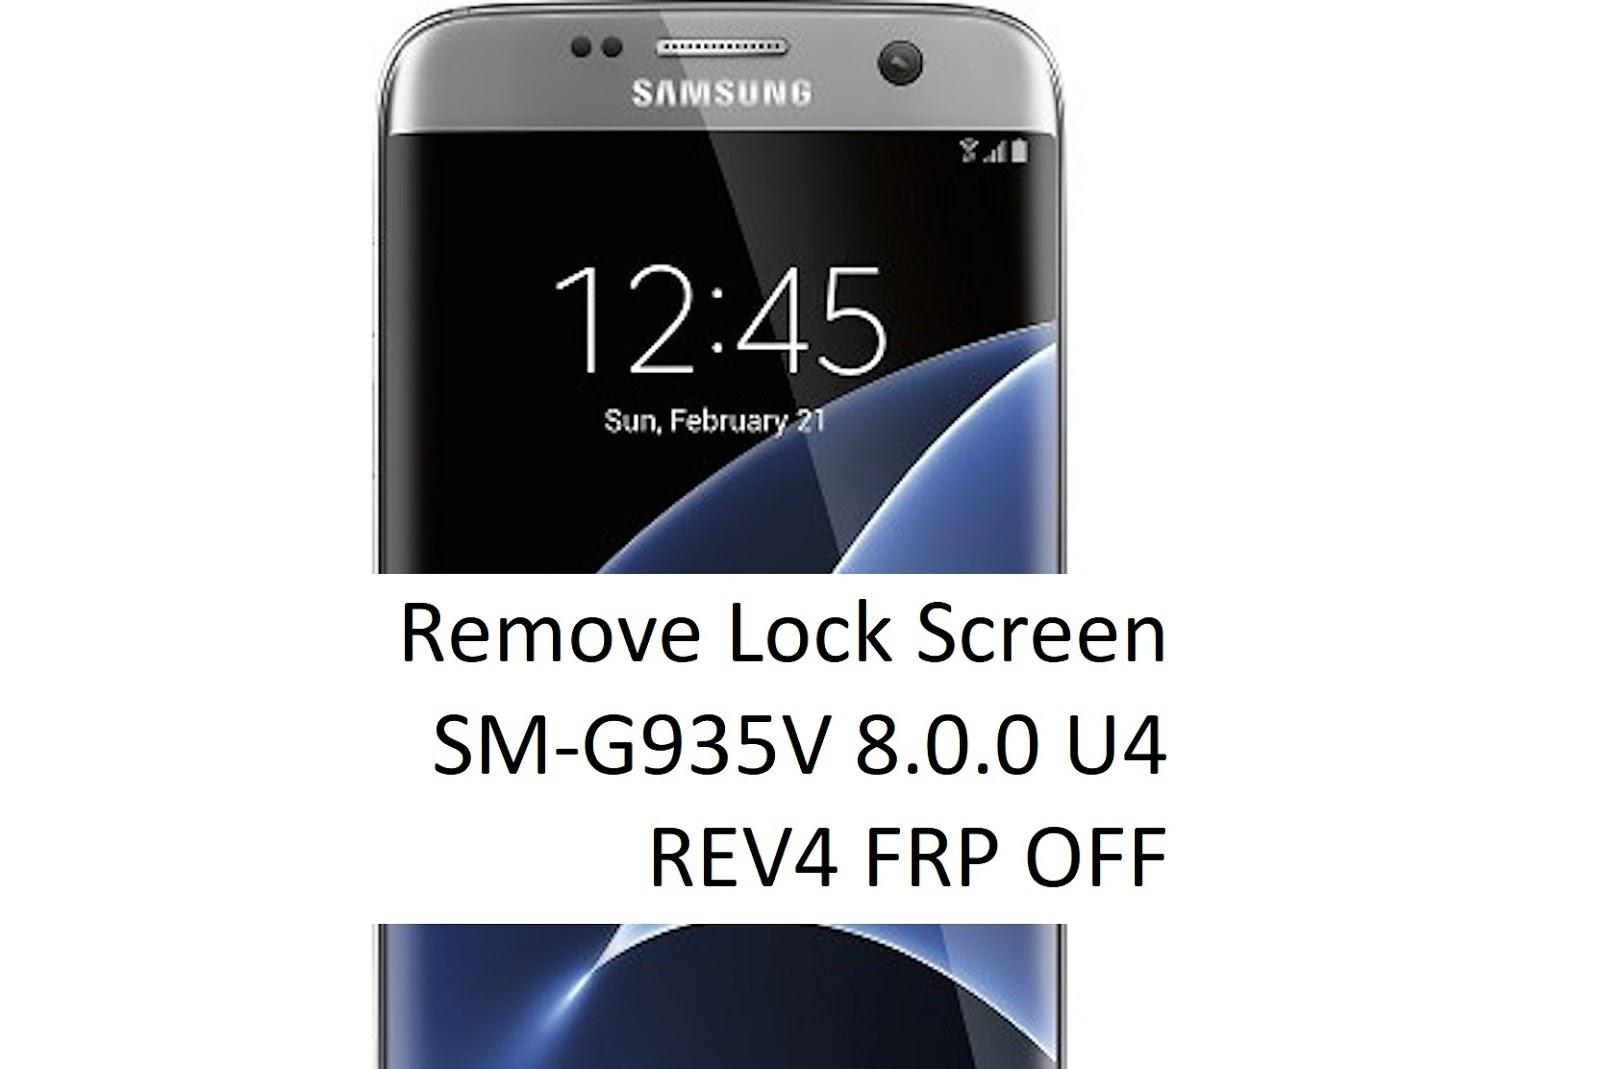 SM-G935V Android 8 0 0 Oreo Binary U4 REV4 Remove Lock Screen FRP